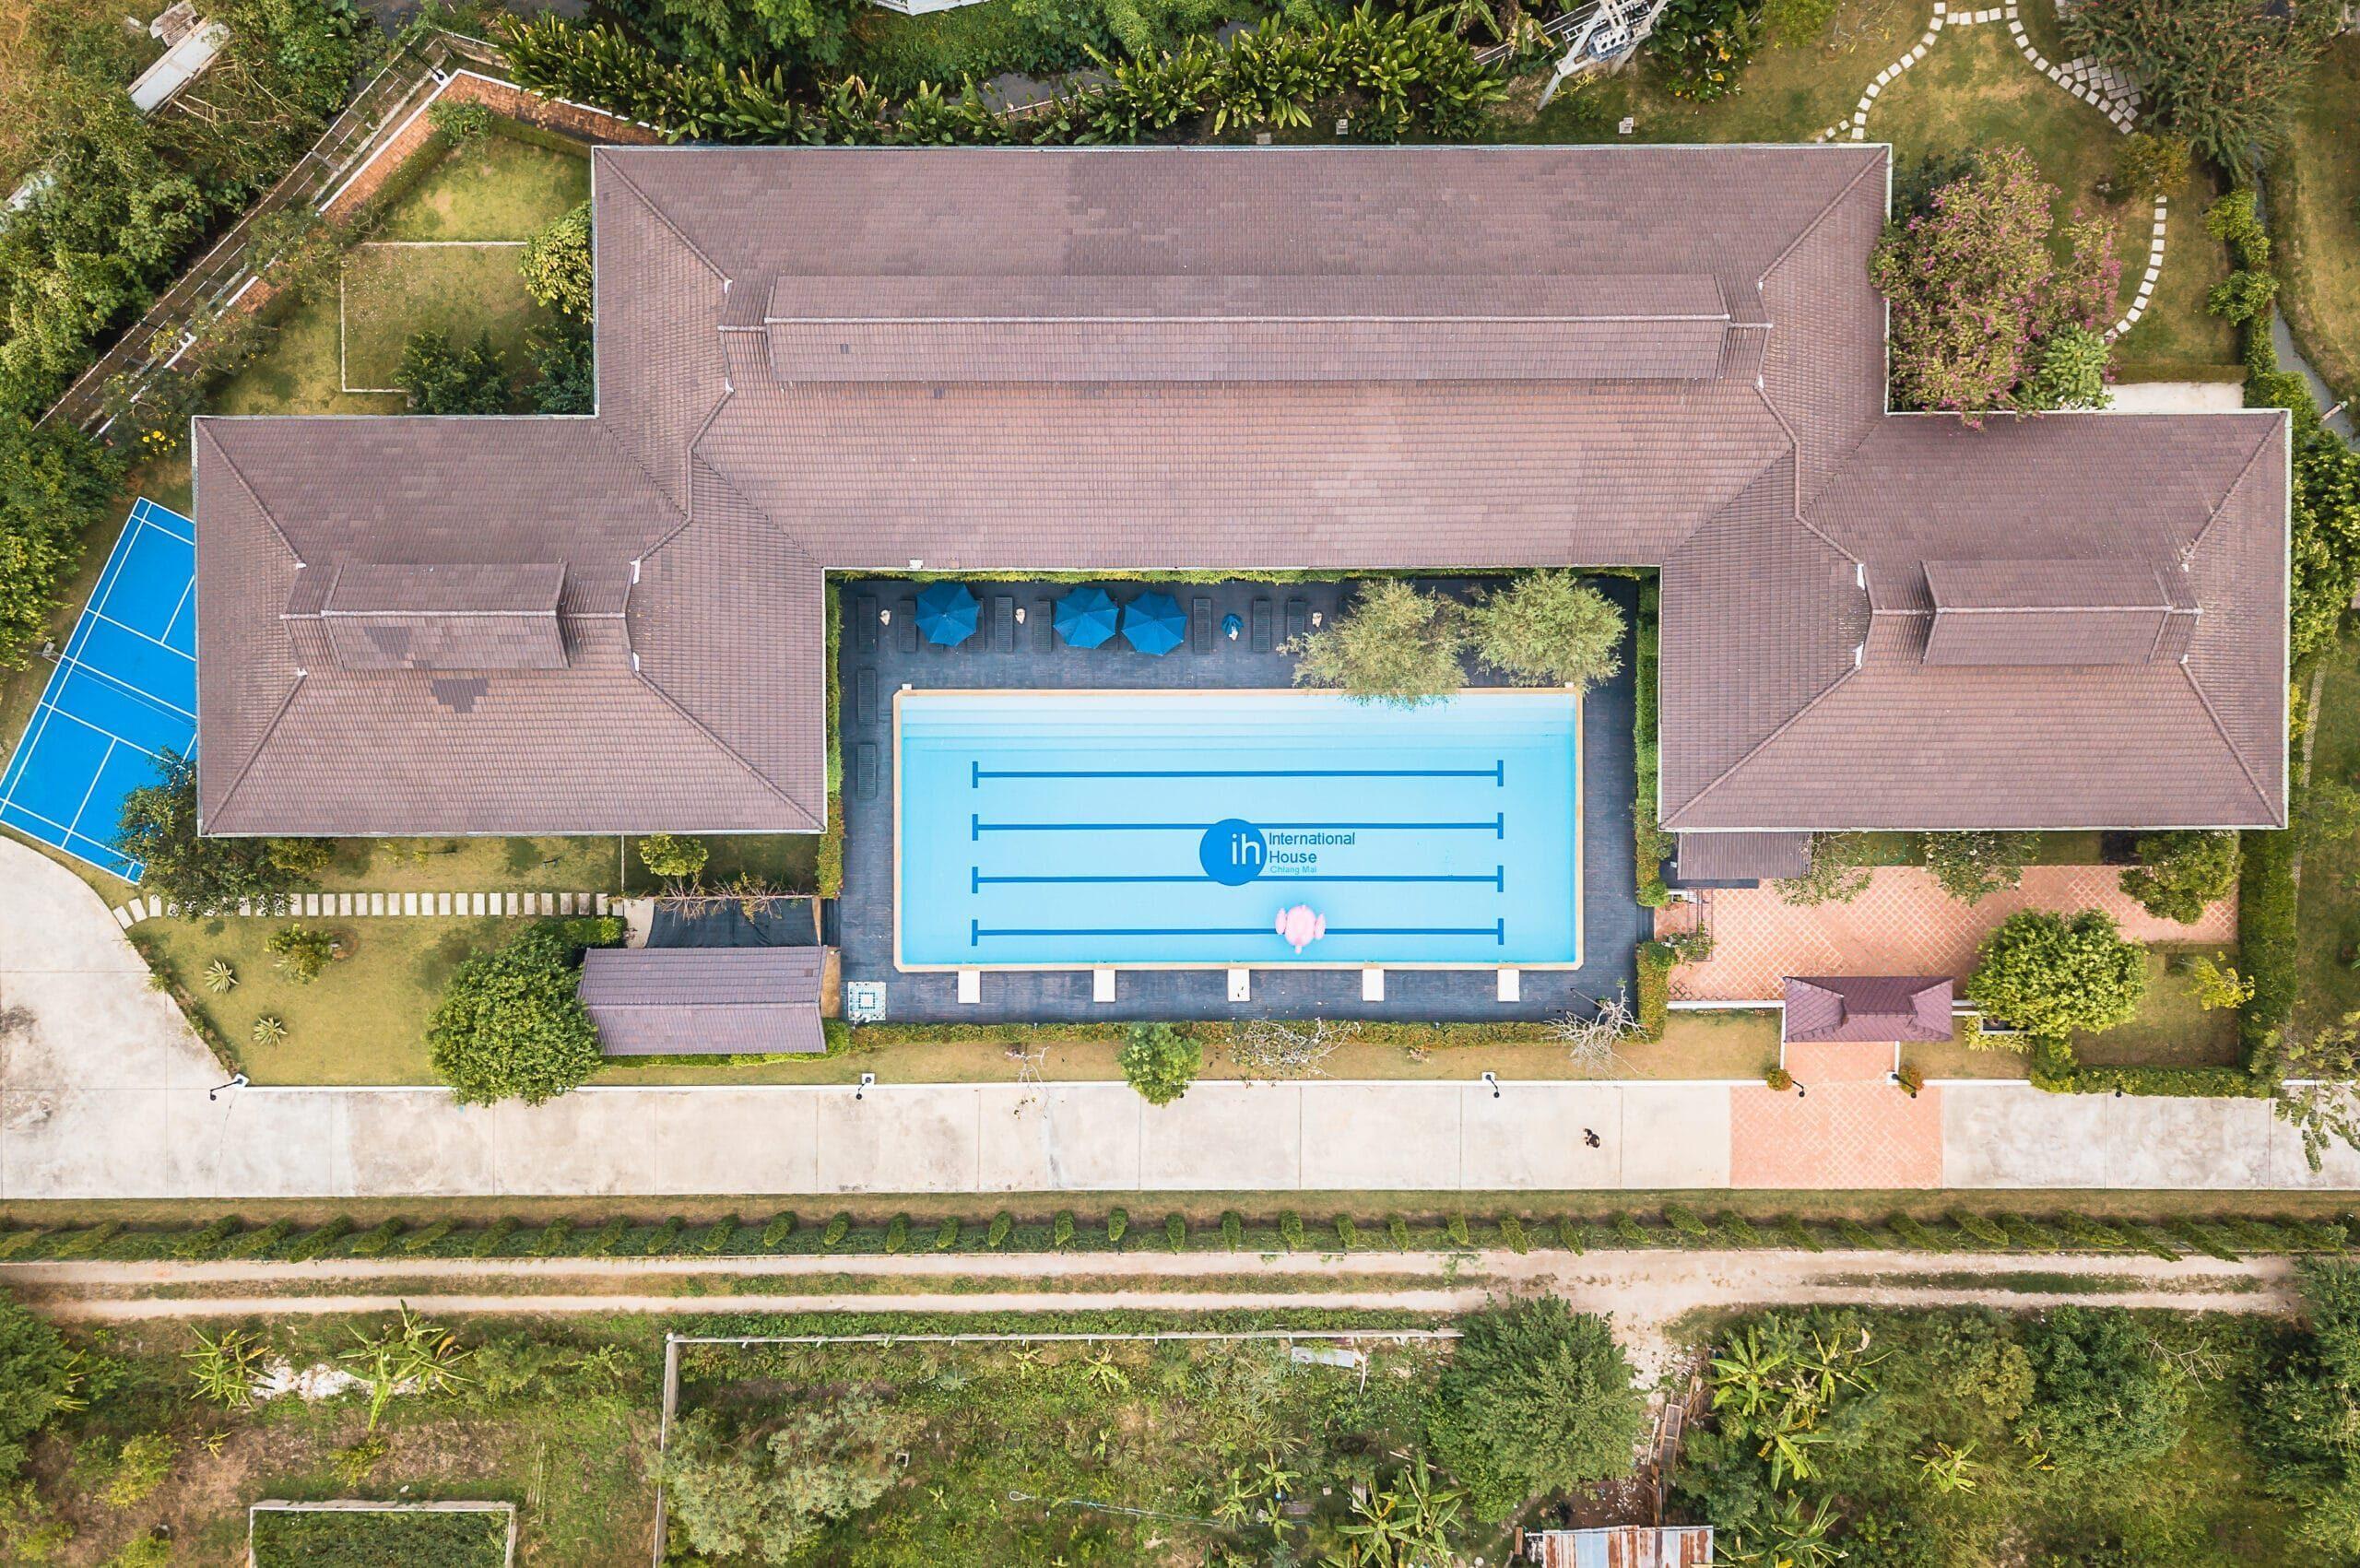 A Drone Shot – 1 – Accommodation + Pool – IH Chiang Mai